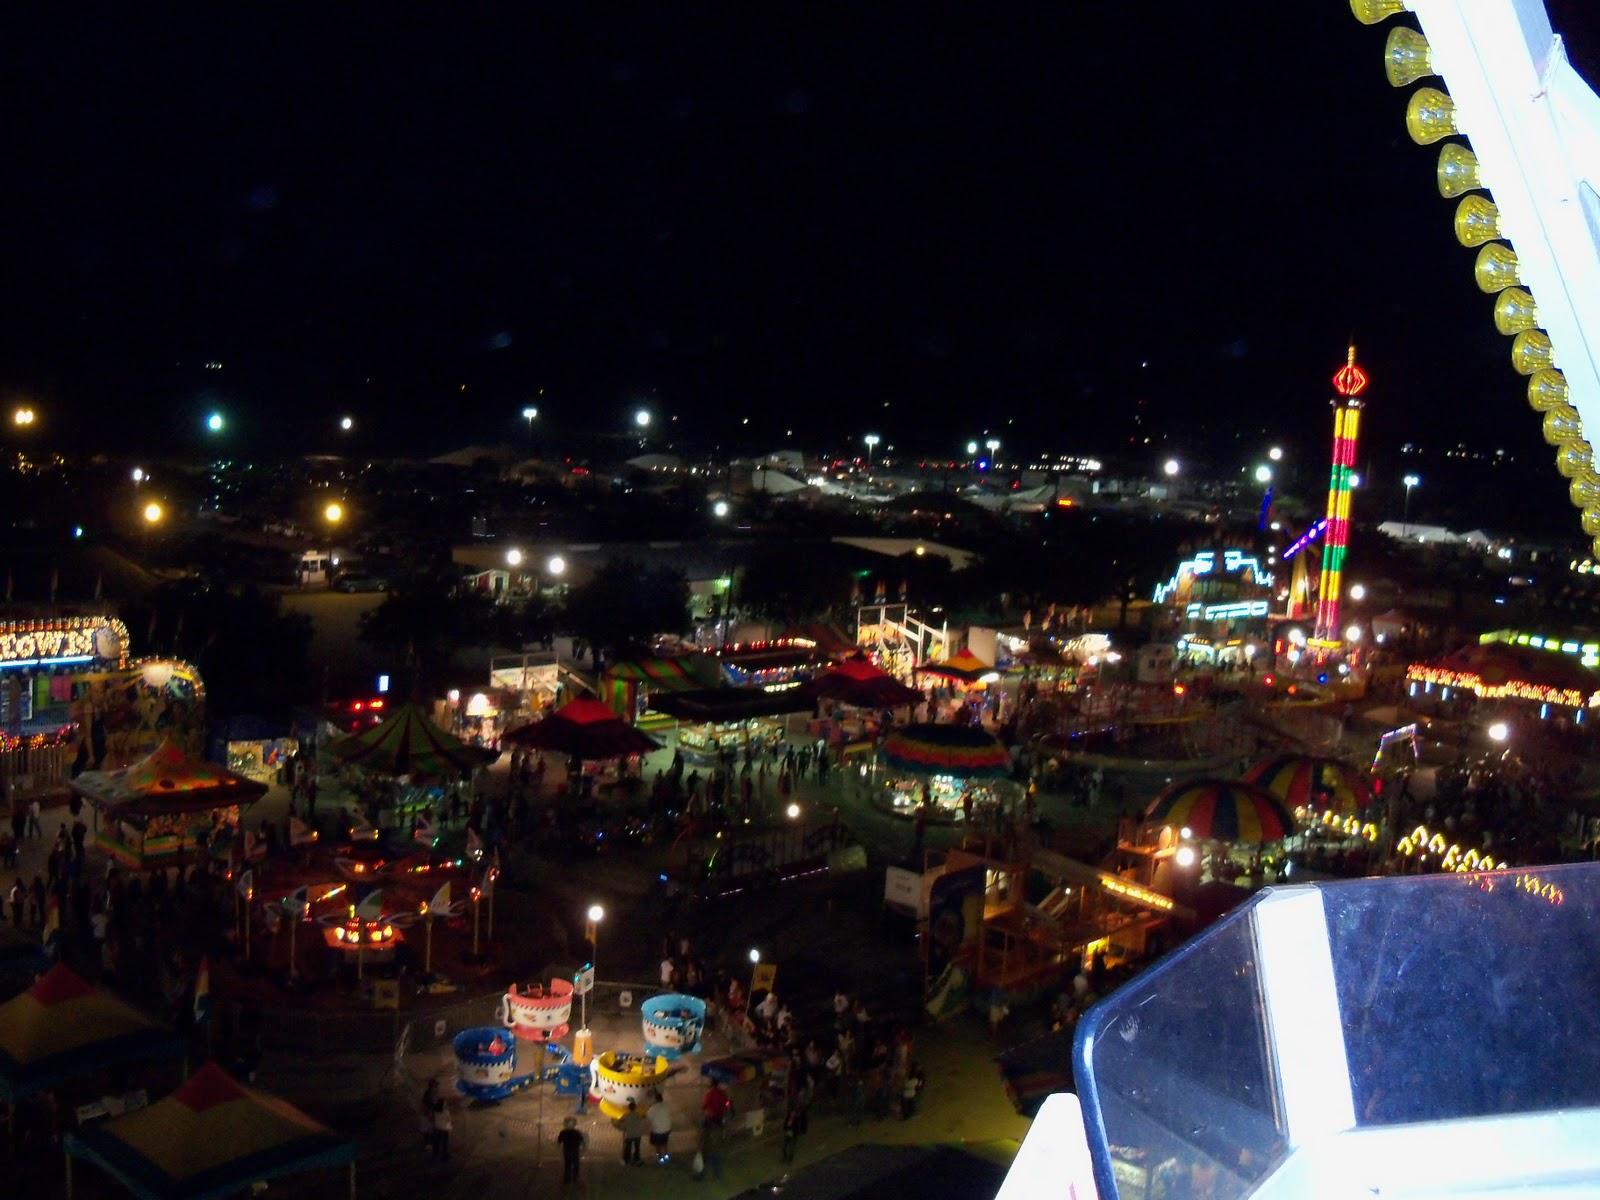 Fort Bend County Fair 2010 - 101_6053.JPG